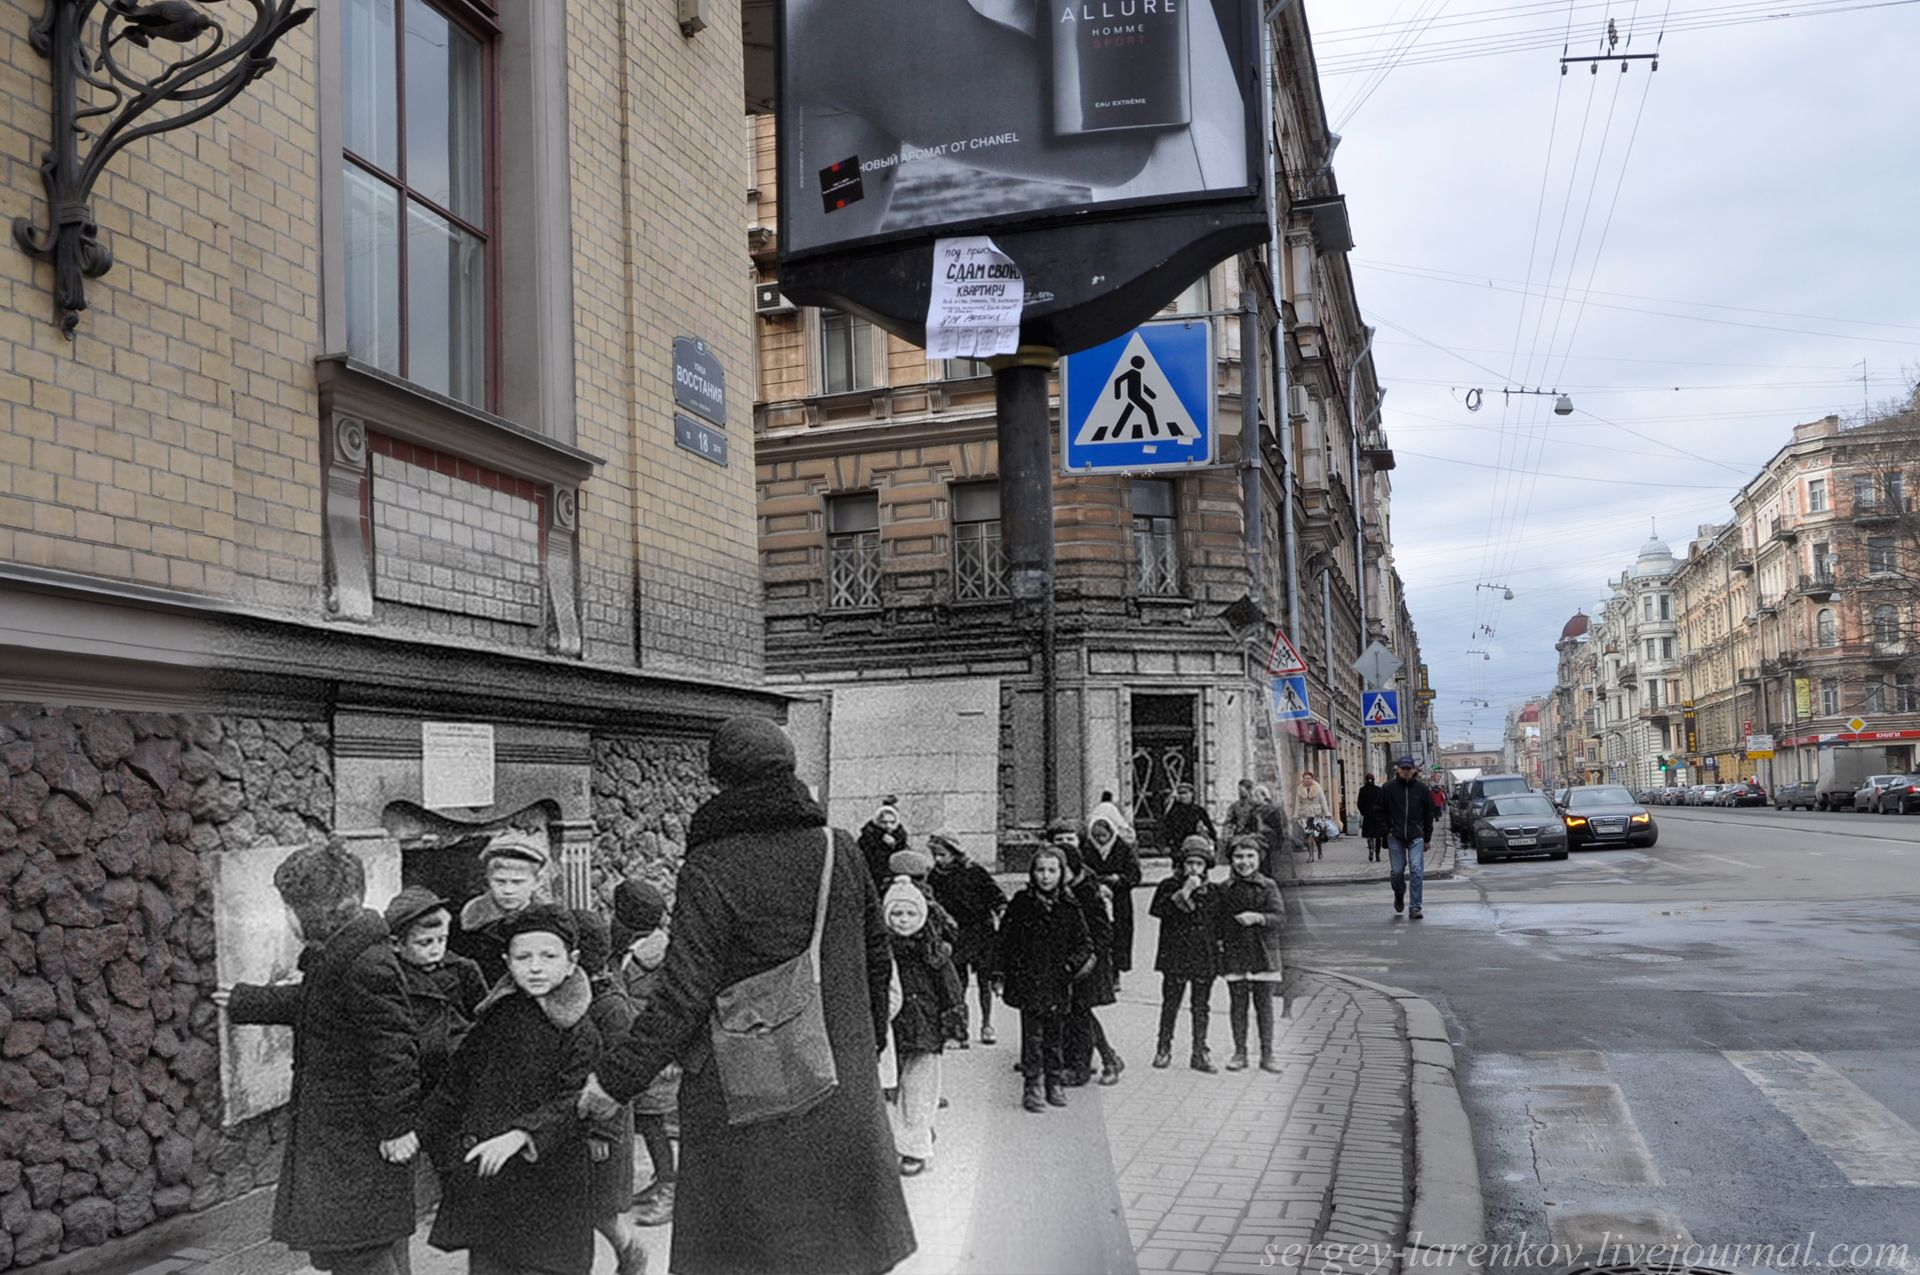 Leningrad 1941 / St.Petersburg 2012 Vosstaniya st./Kovenskiy st. Children of besieged Leningrad.